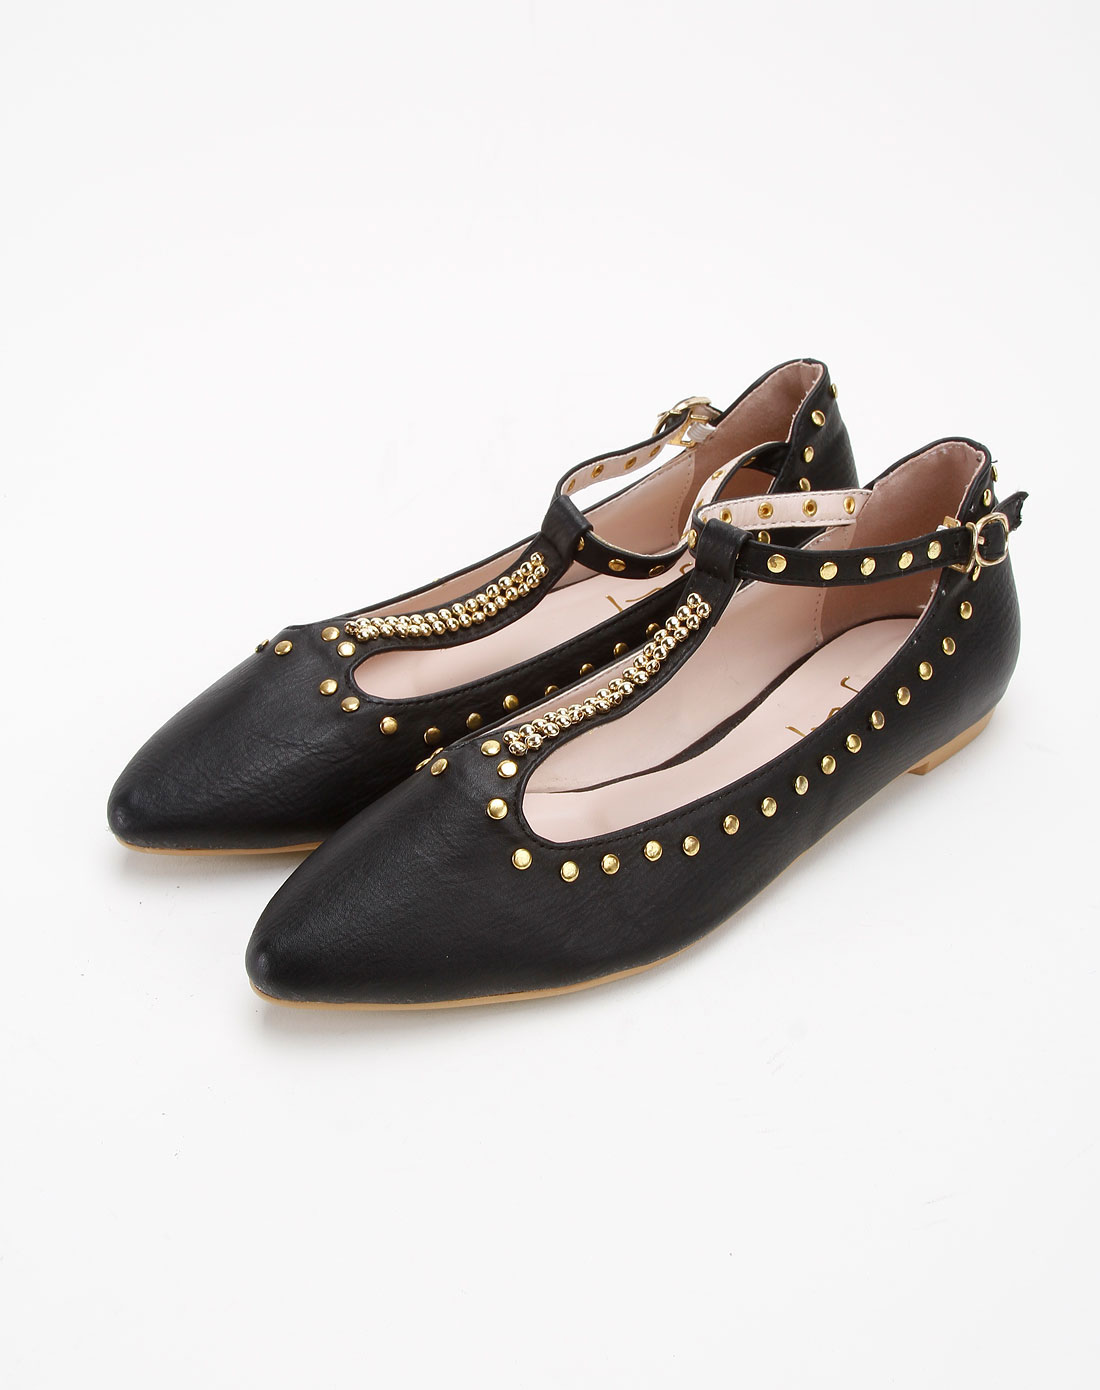 ggirl女款黑色休闲系列平底尖头鞋69121105700101